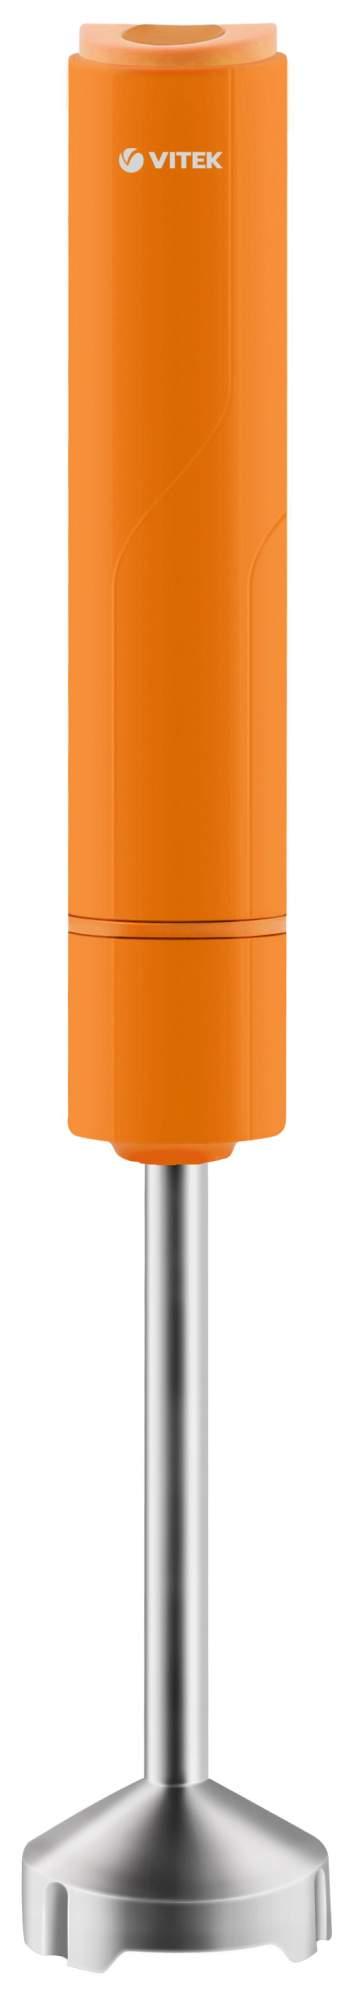 Блендер VITEK VT-1472 Orange